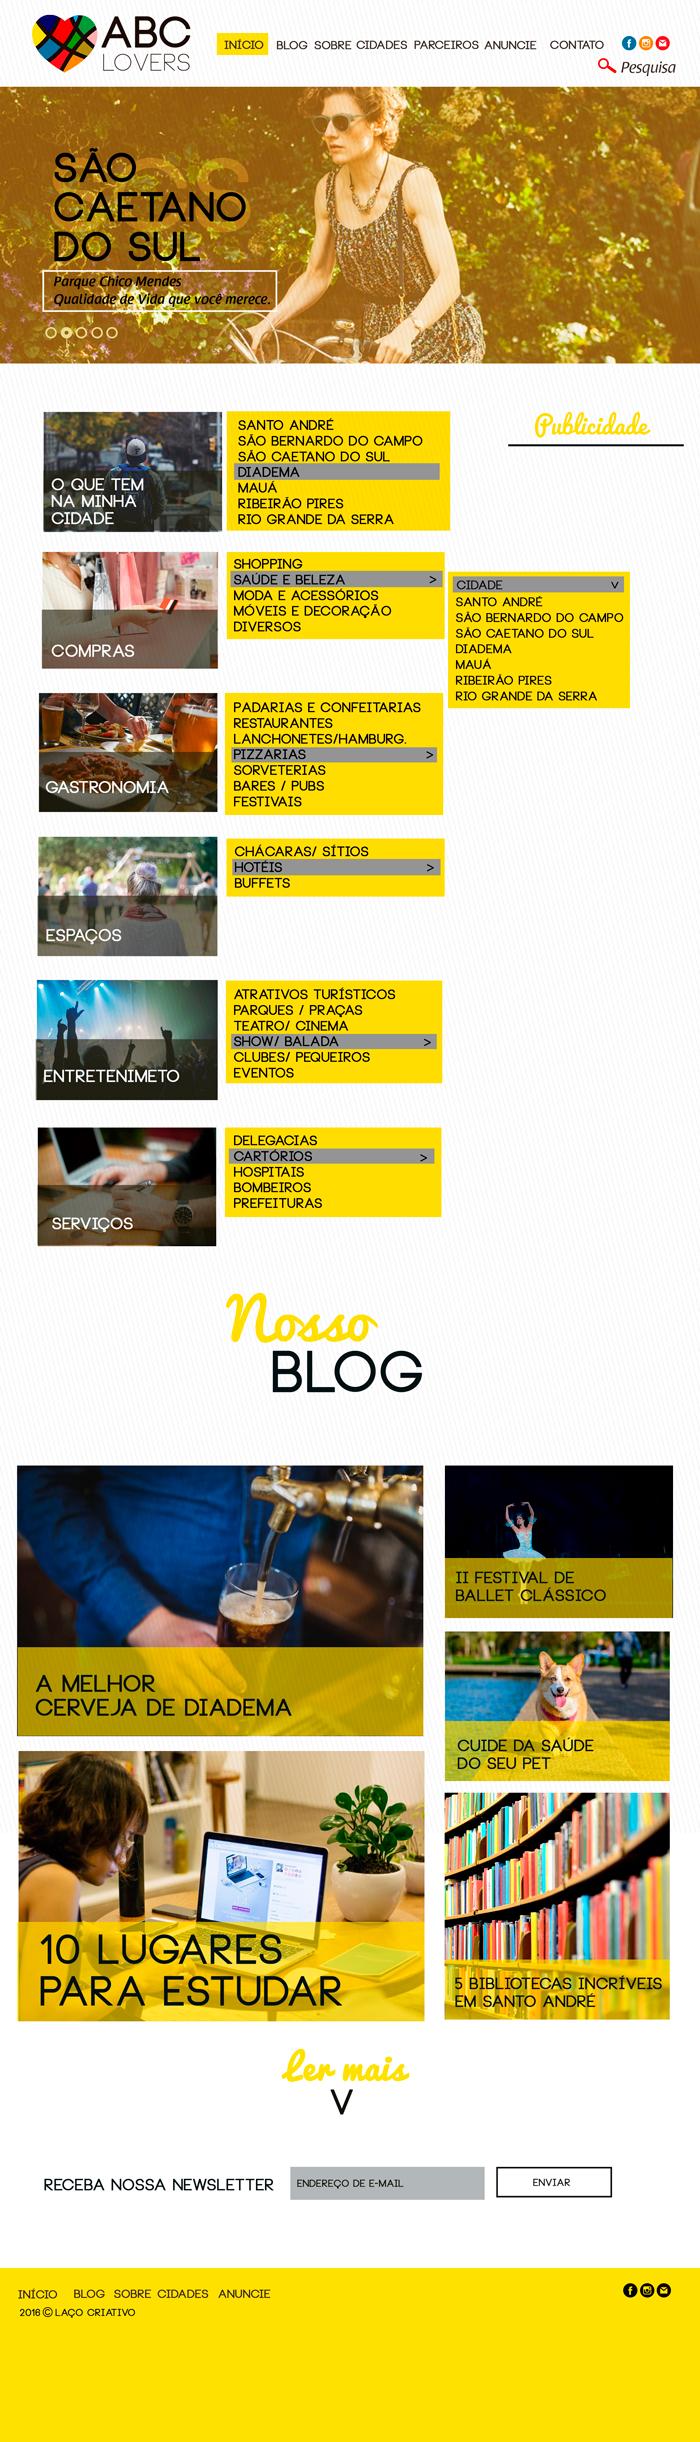 site design gráfico